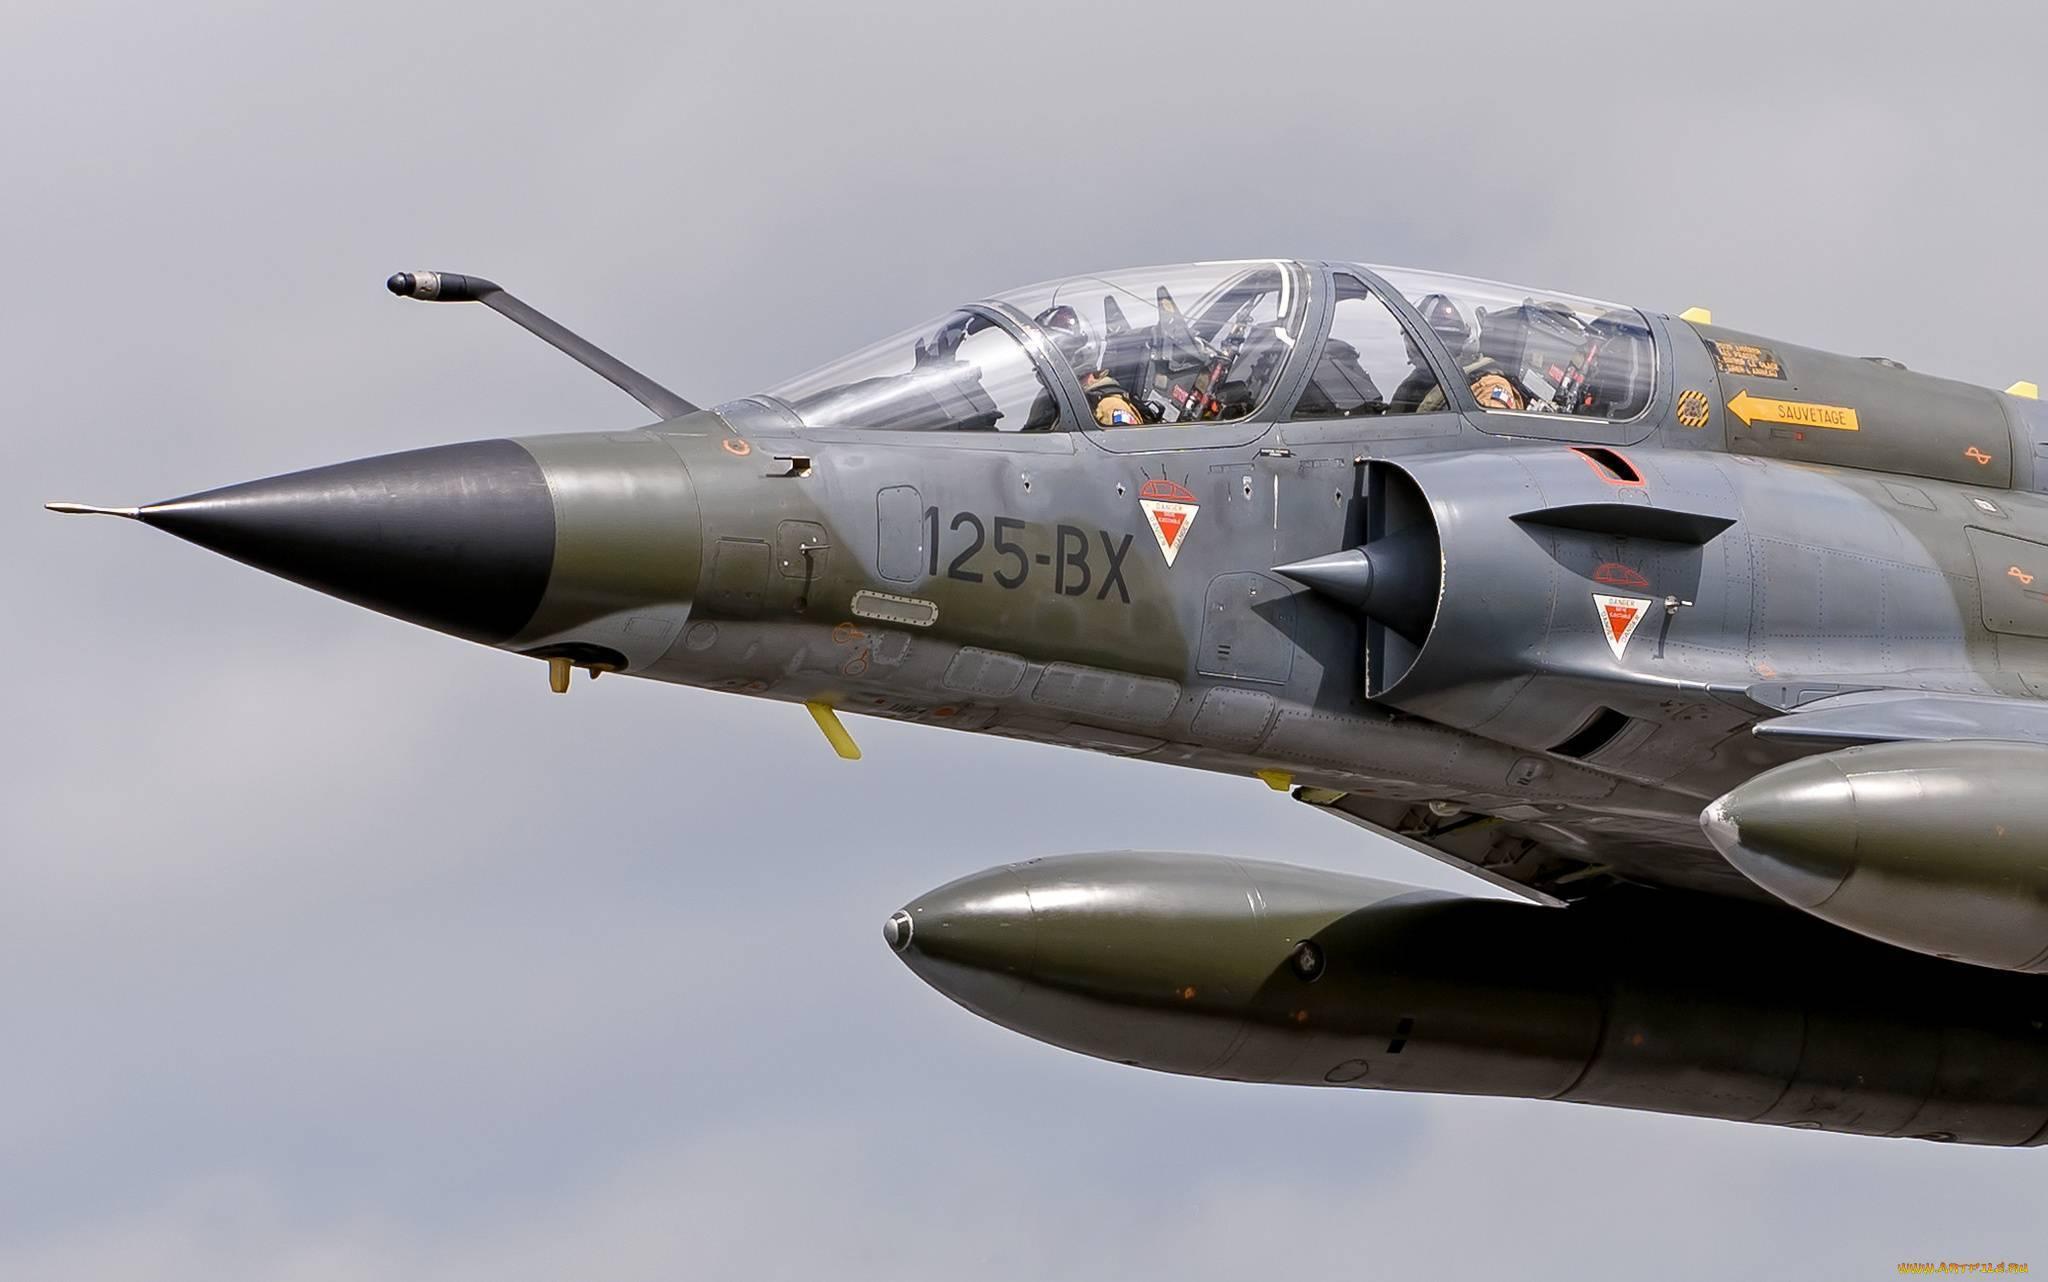 Mirage 2000 википедия